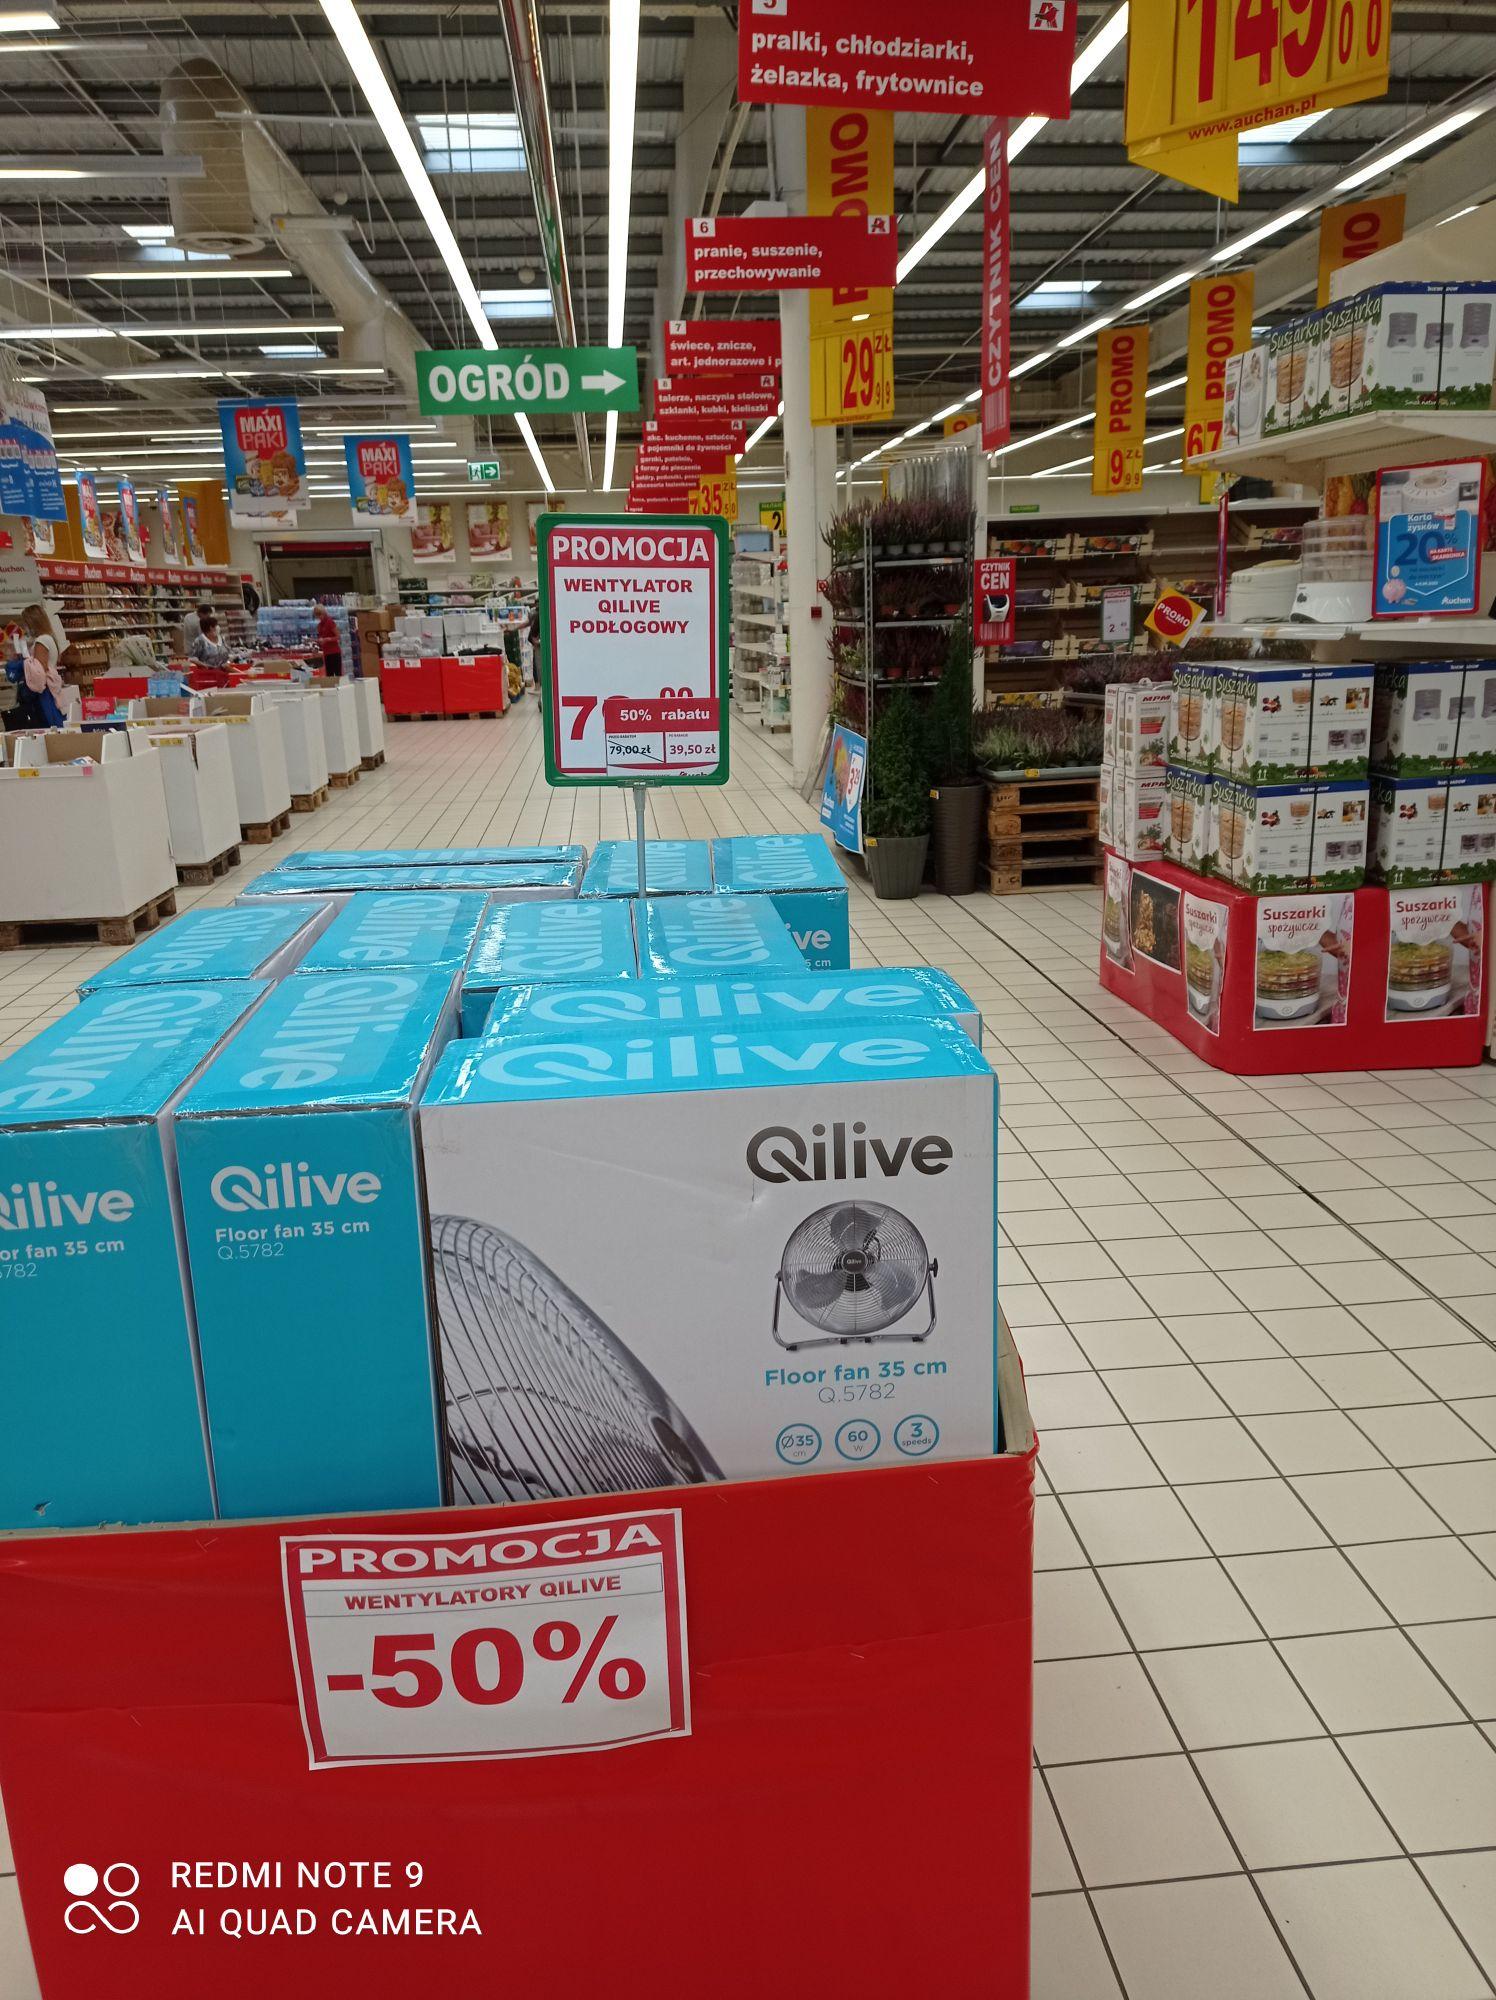 Promo w Auchan Legnica